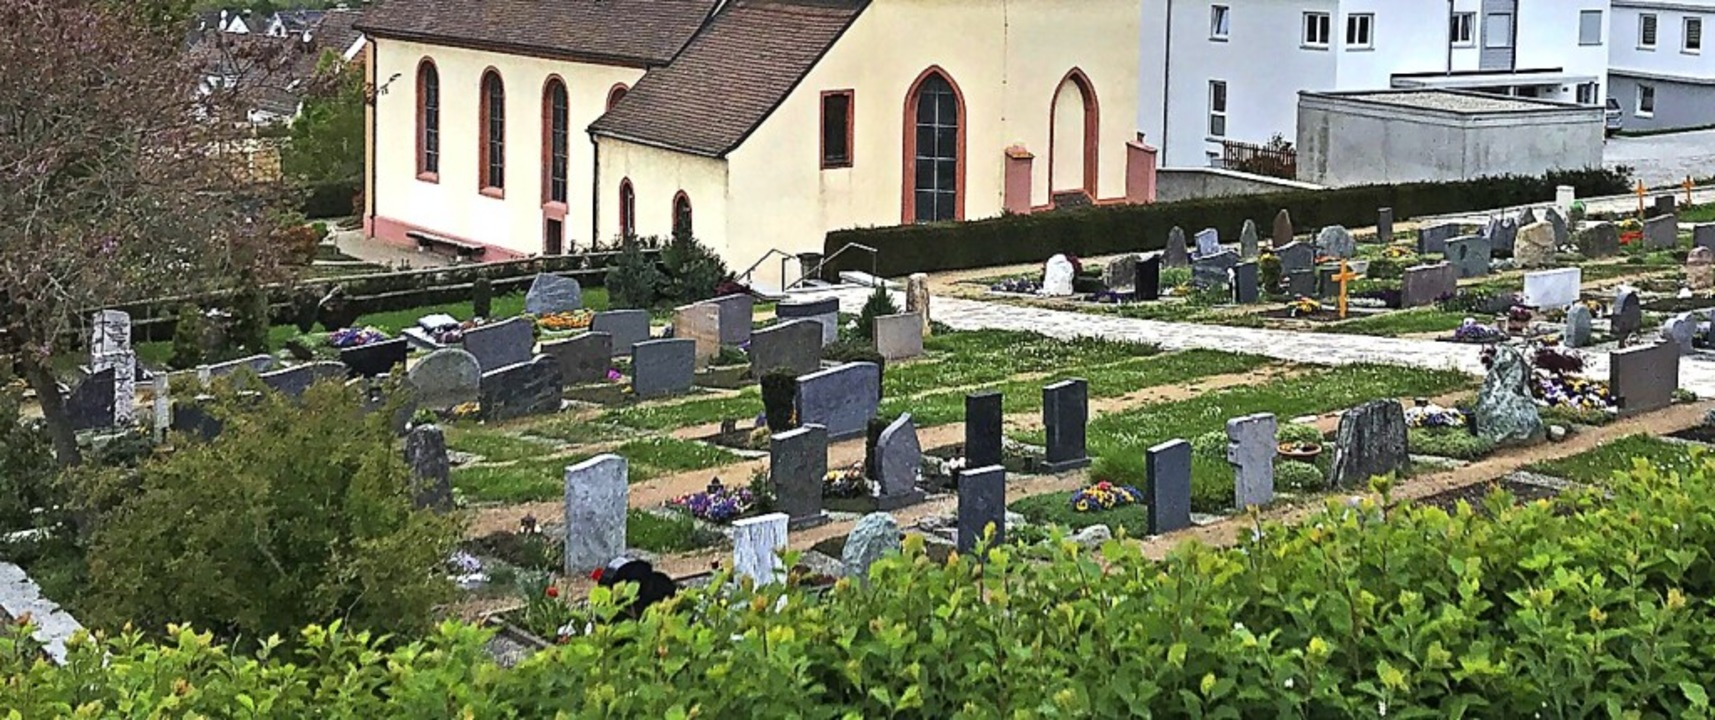 Der Friedhof an der katholischen Kirche St. Leodegar in Bad Bellingen  | Foto: Jutta Schütz